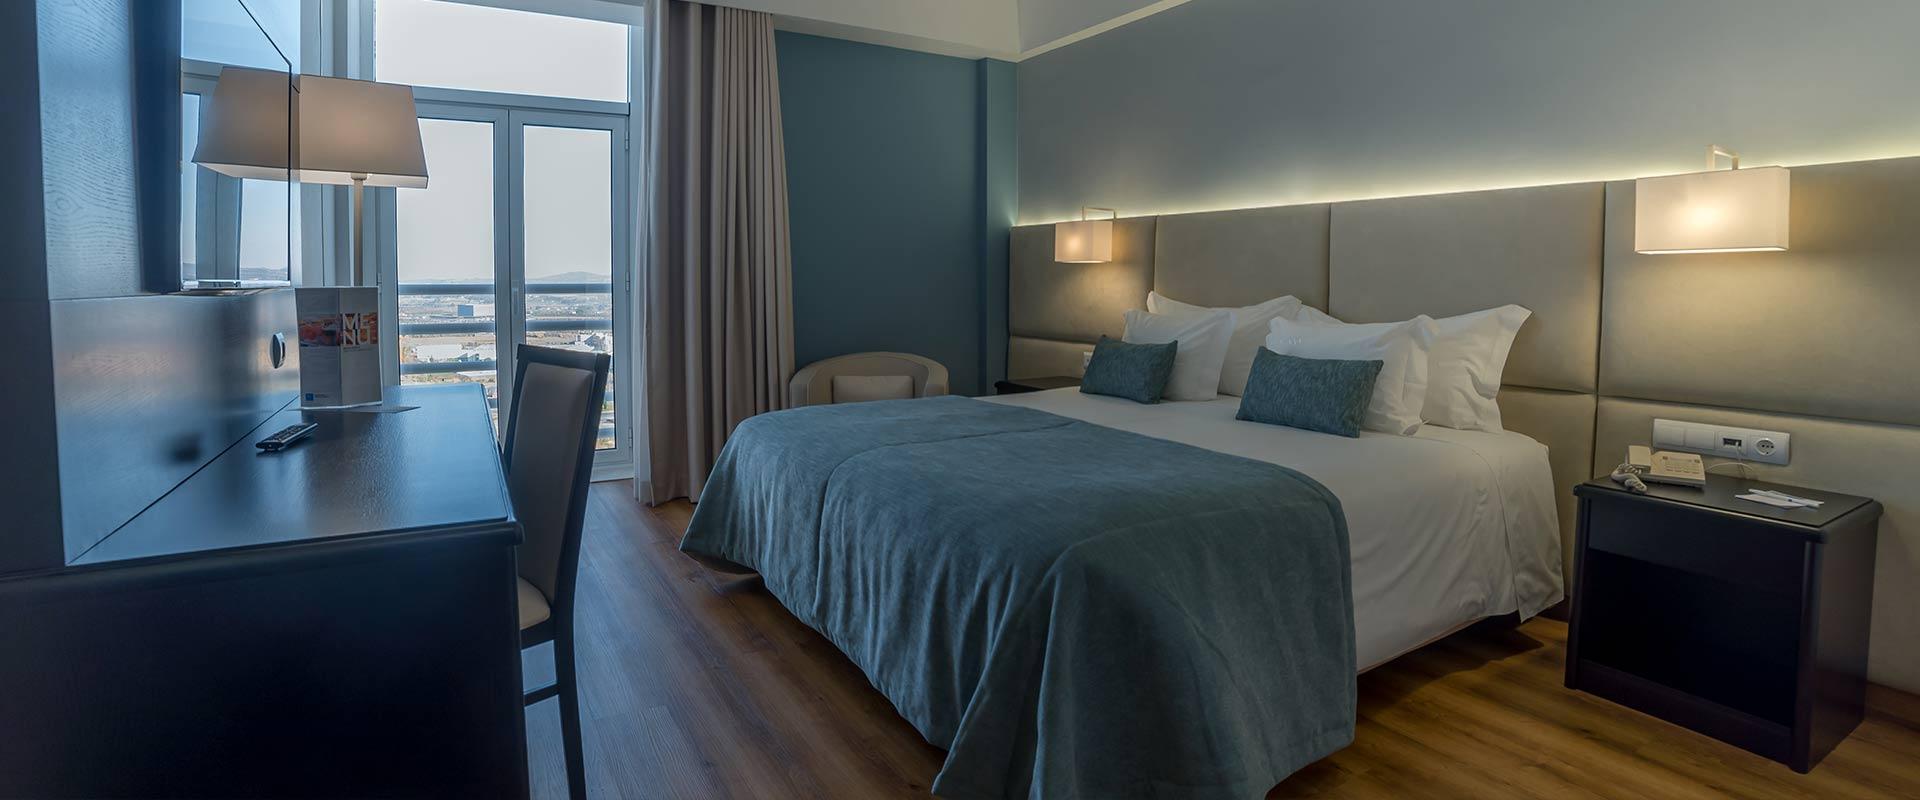 Dona-Maria-RMPZ-Hotel-M-QAzul.jpg